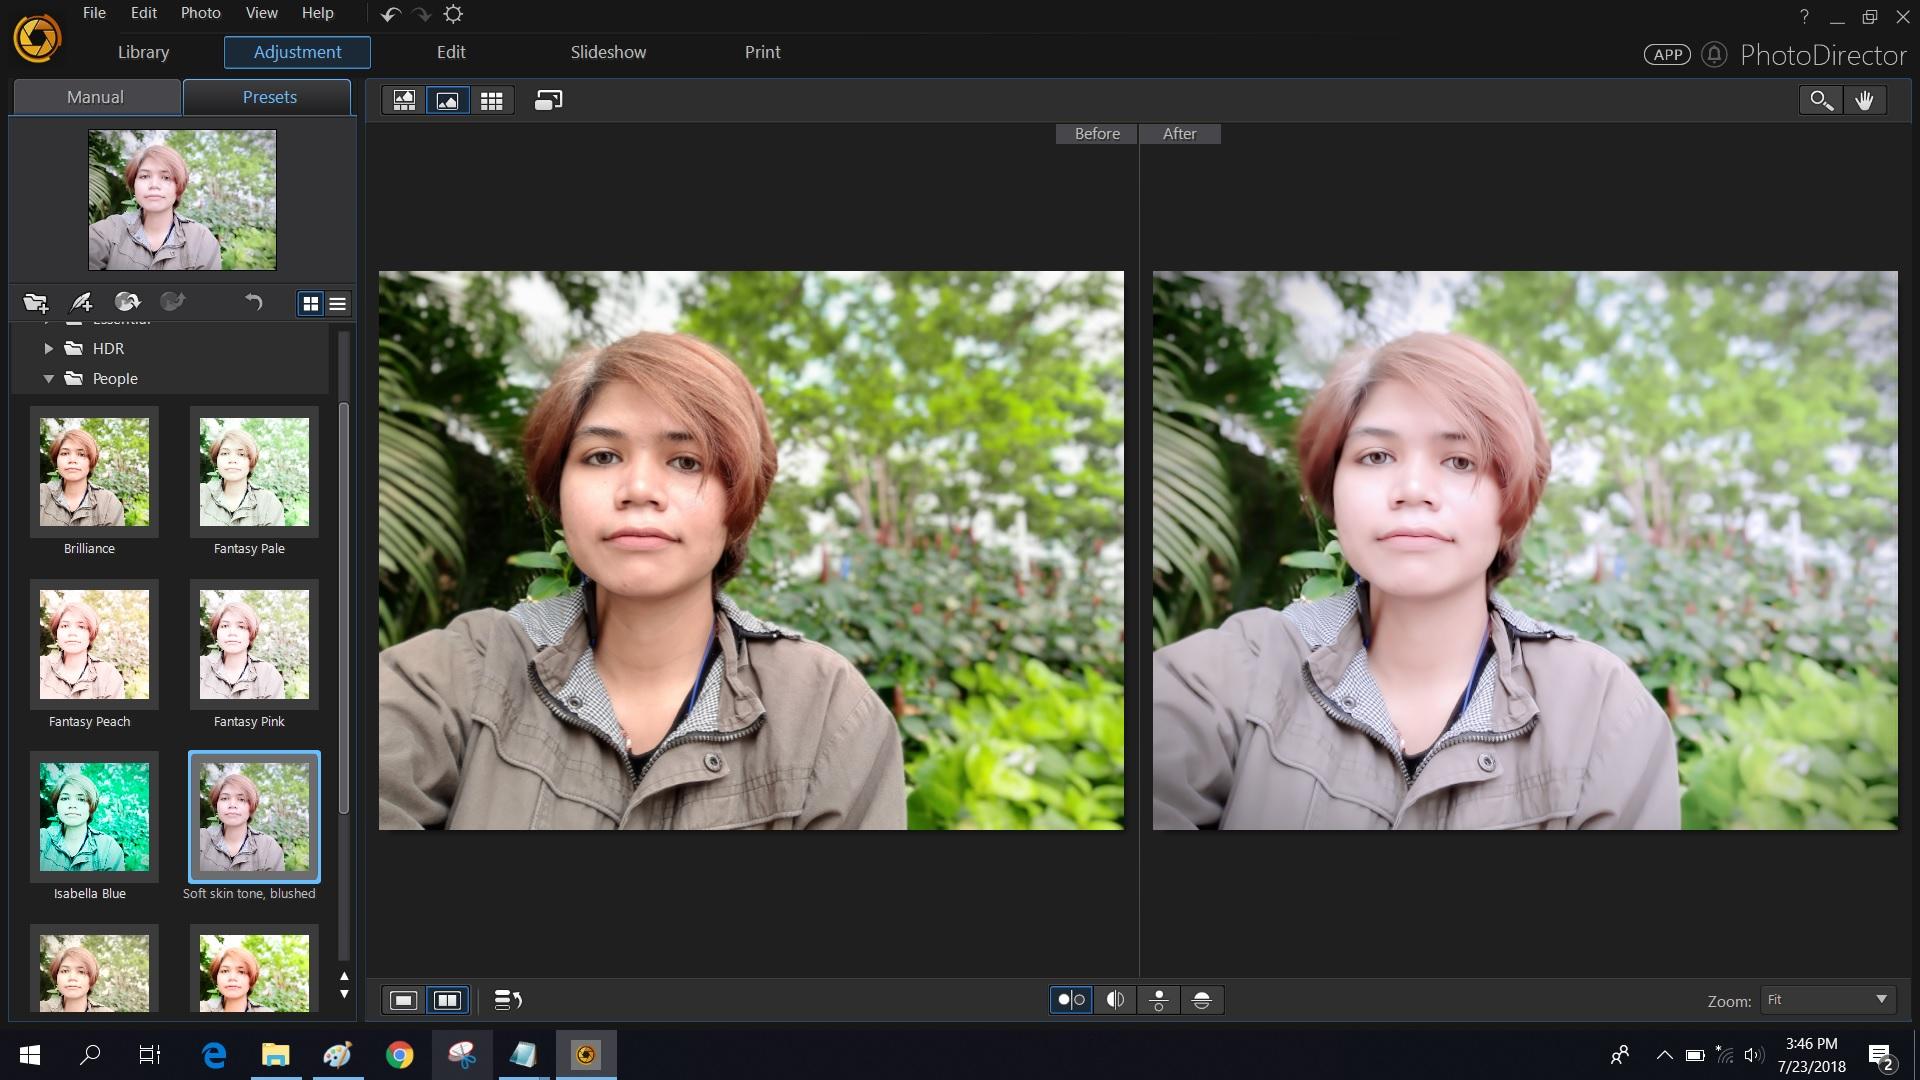 ASUS juga menambangkan aplikasi Director8 dan PowerDirector yang berfungsi untuk mengedit foto dan video